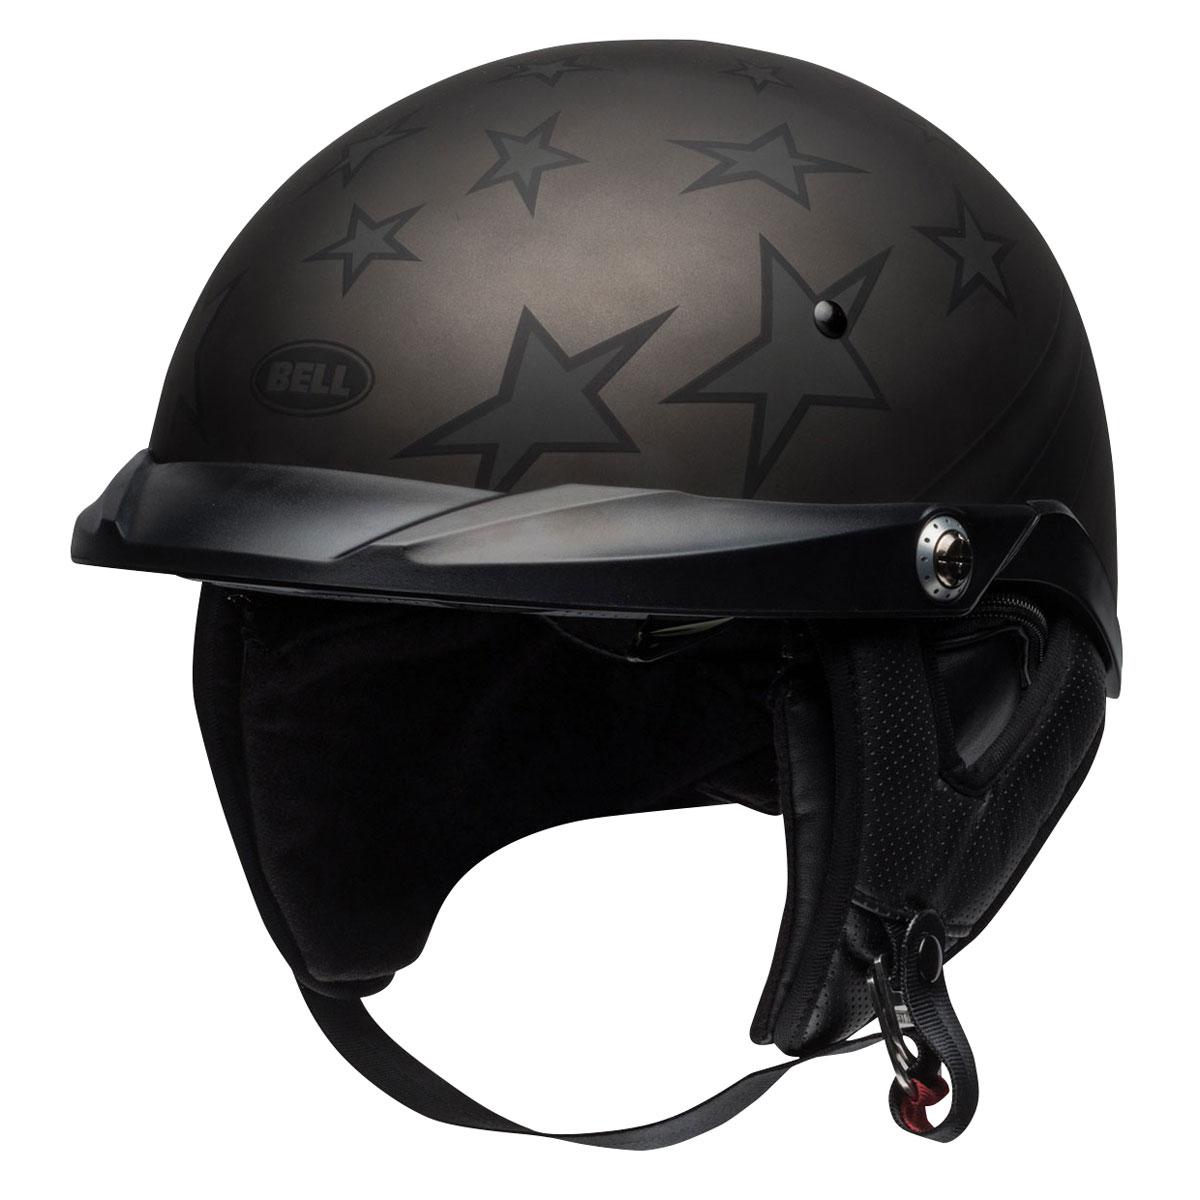 Bell Pit Boss Honor Half Helmet